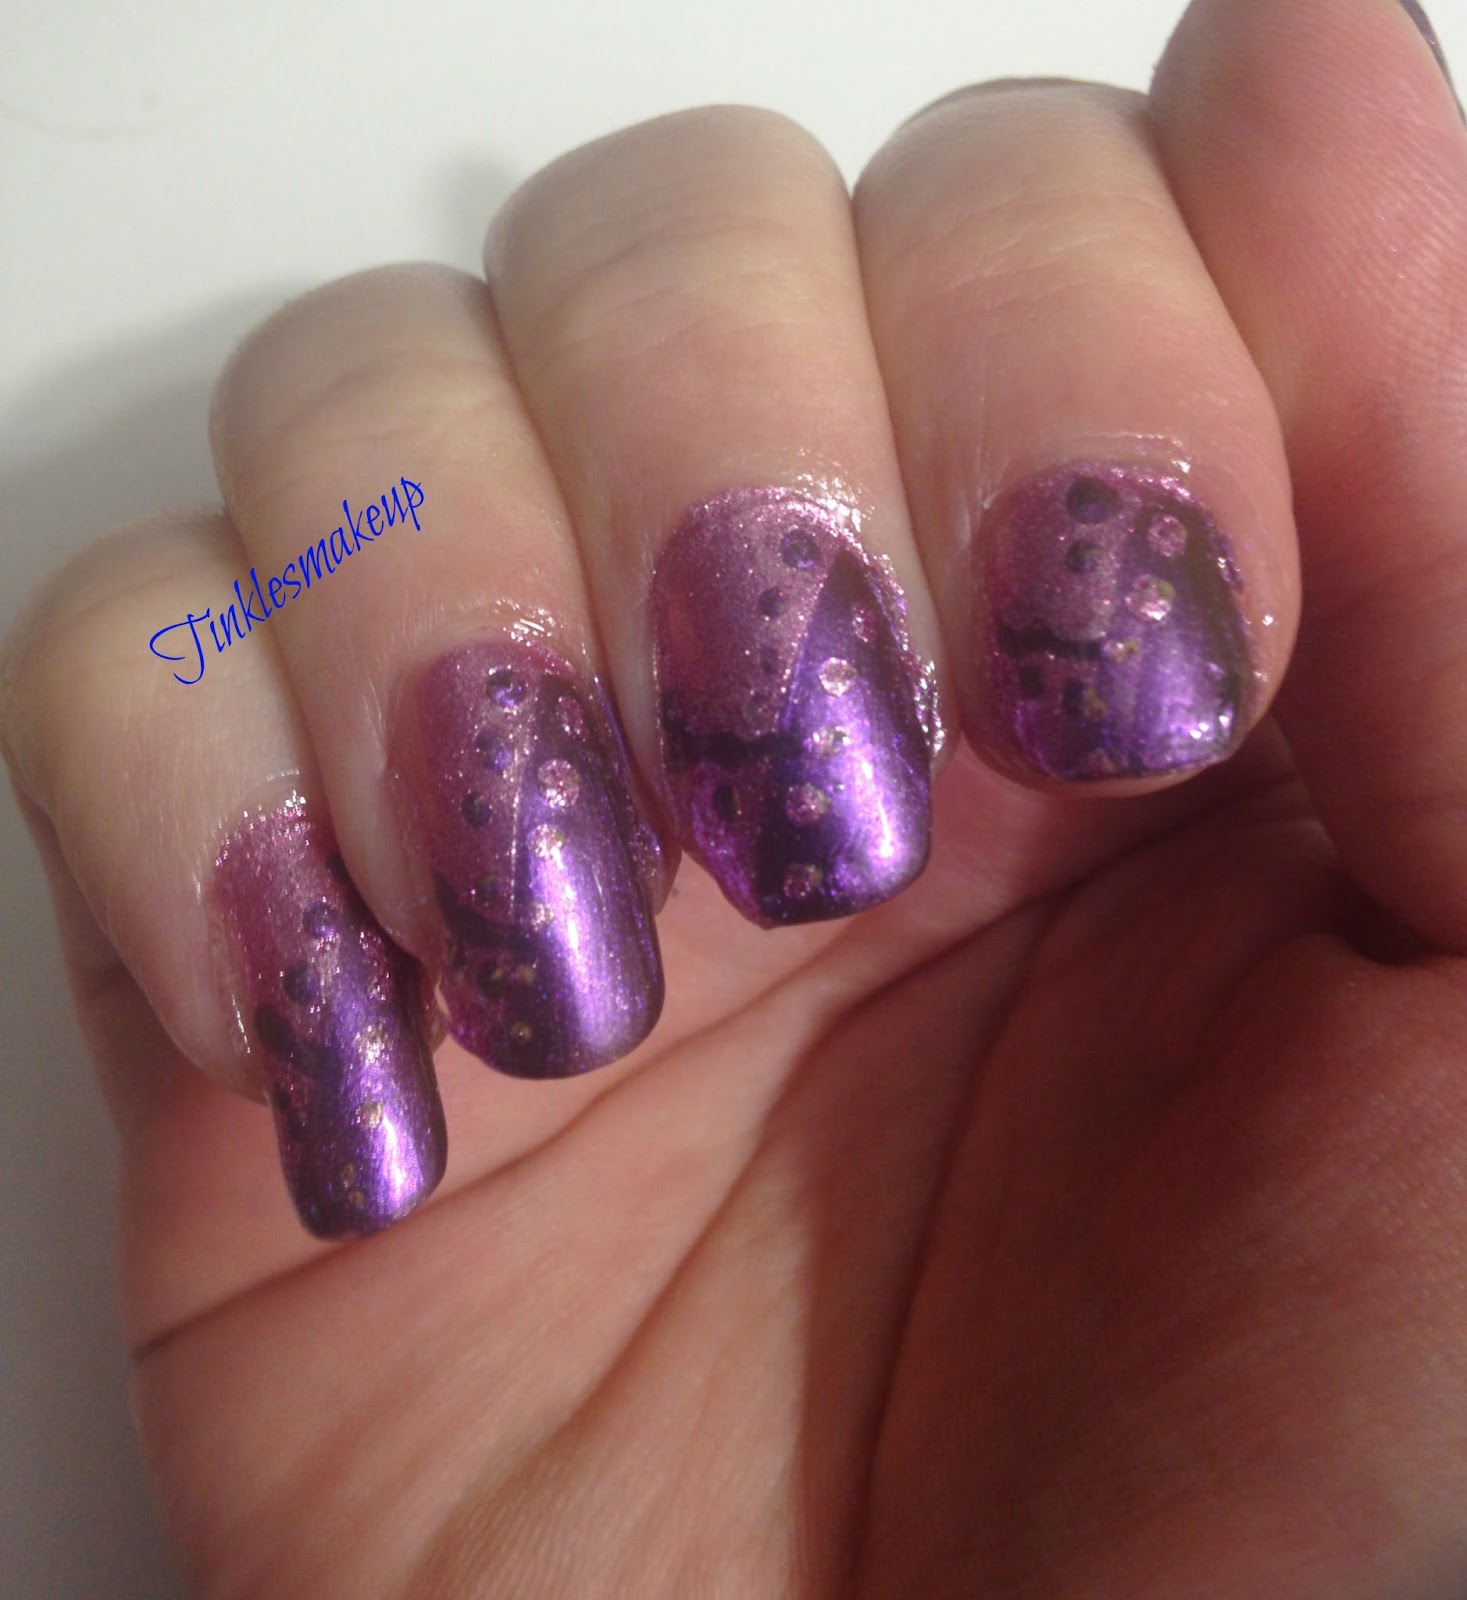 Tinklesmakeup: Dots and lines nail art